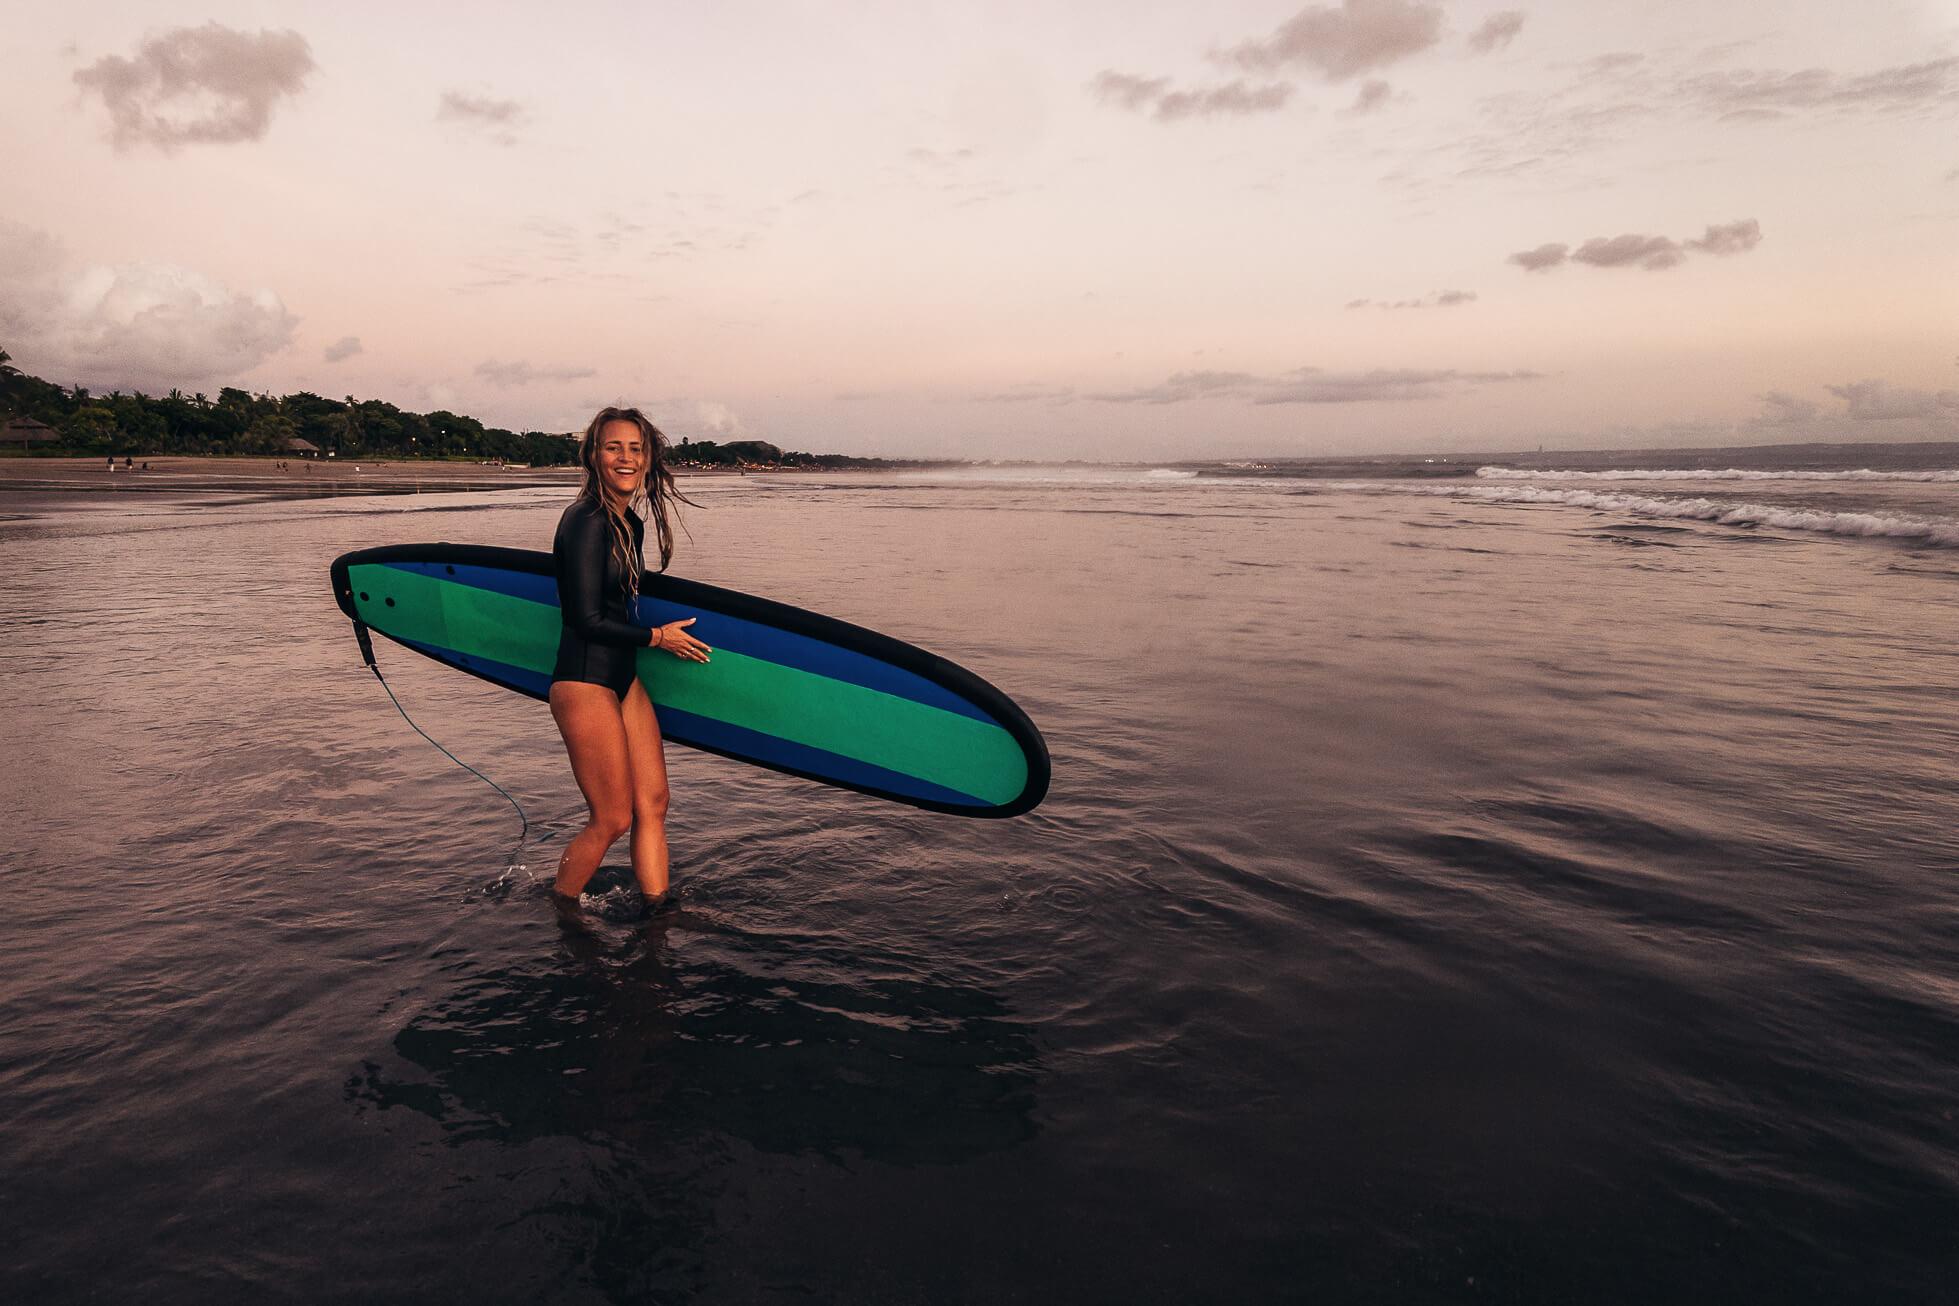 janni-deler-sunset-surf-baliJ1200308-Redigera